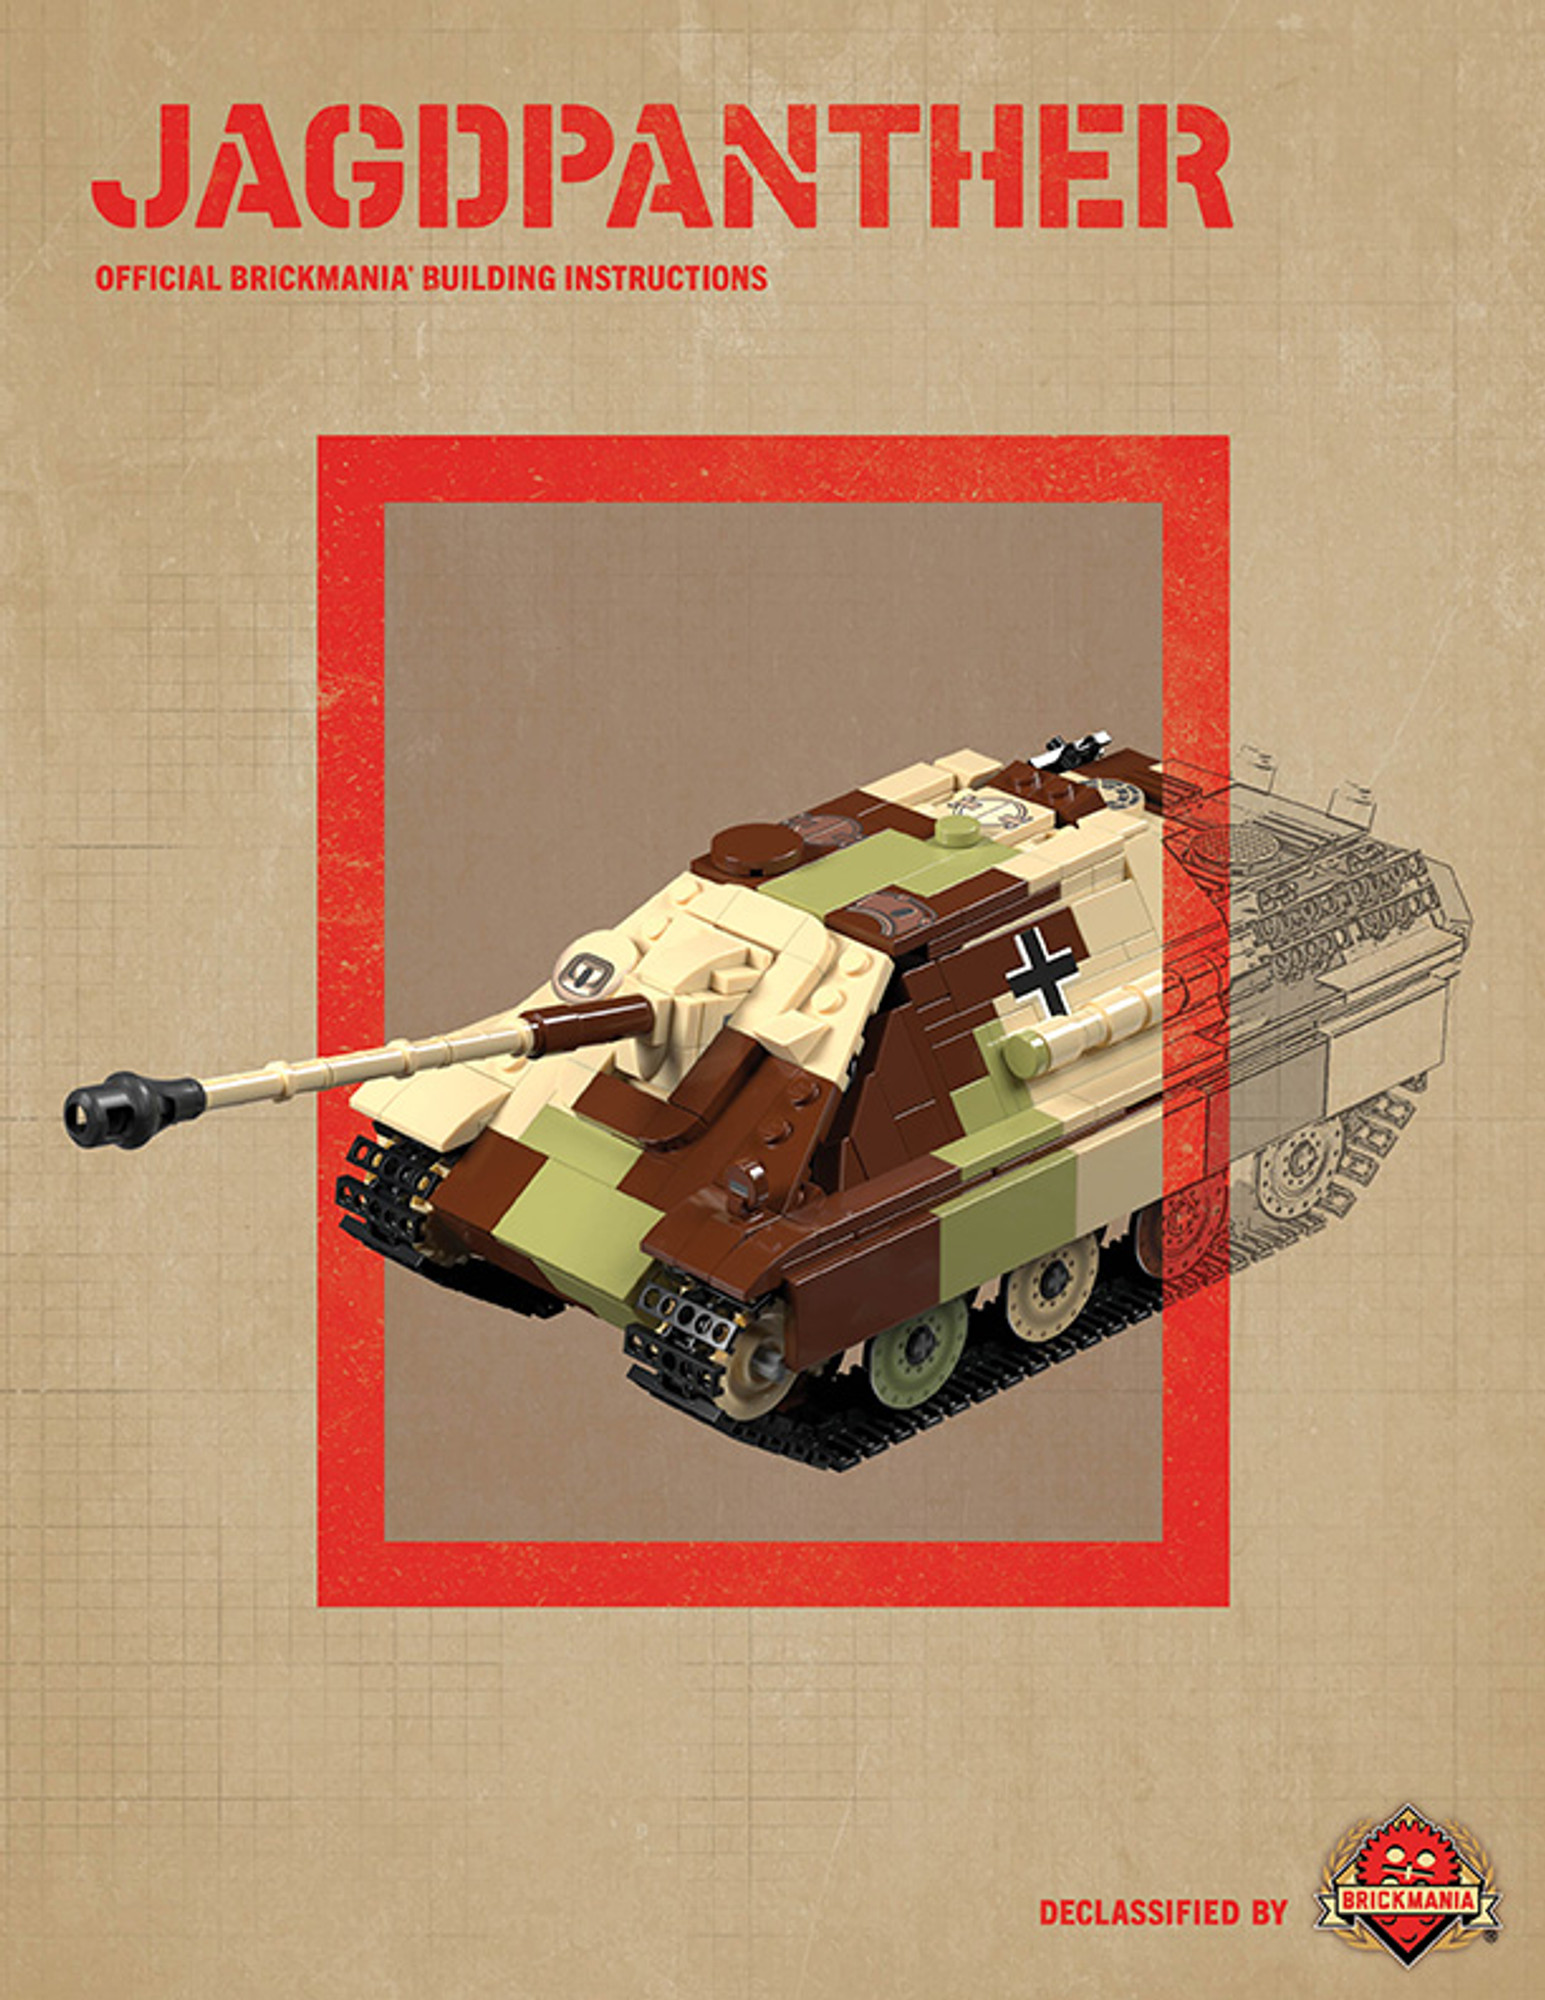 Jagdpanther - Digital Building Instructions - Digital Building Instructions